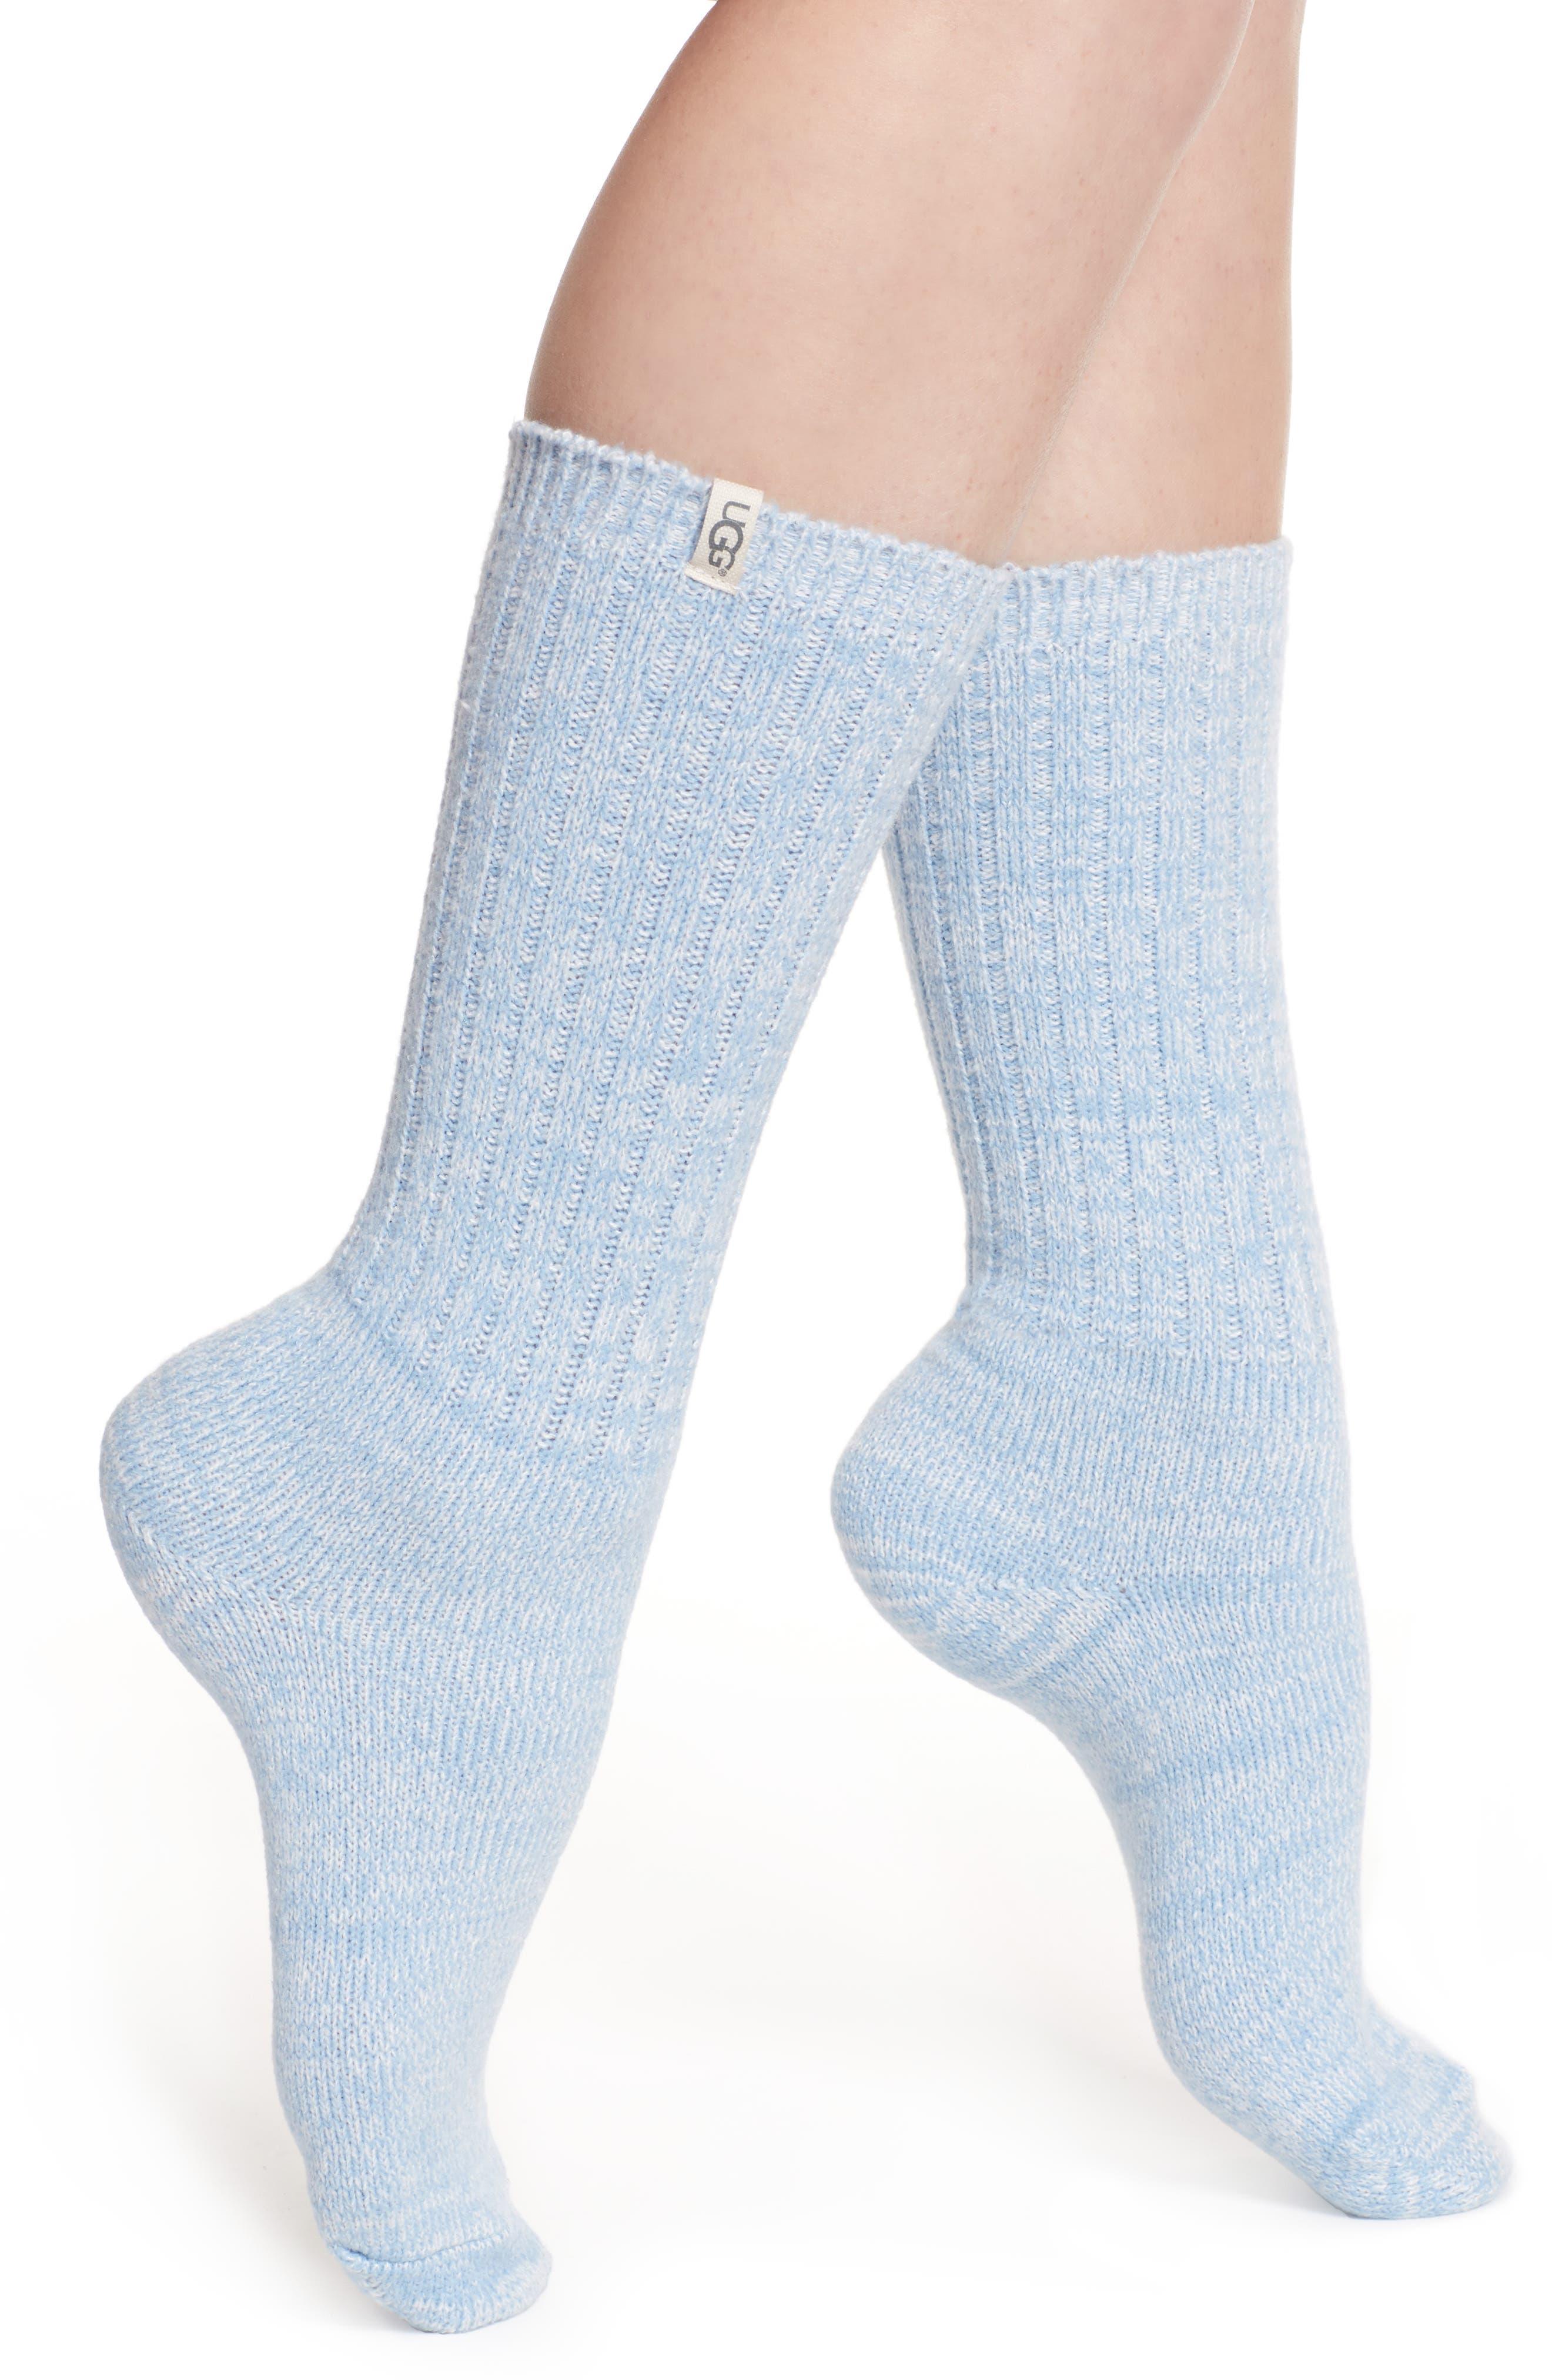 60248d8cb63 Women s Mid-Calf Socks   Hosiery